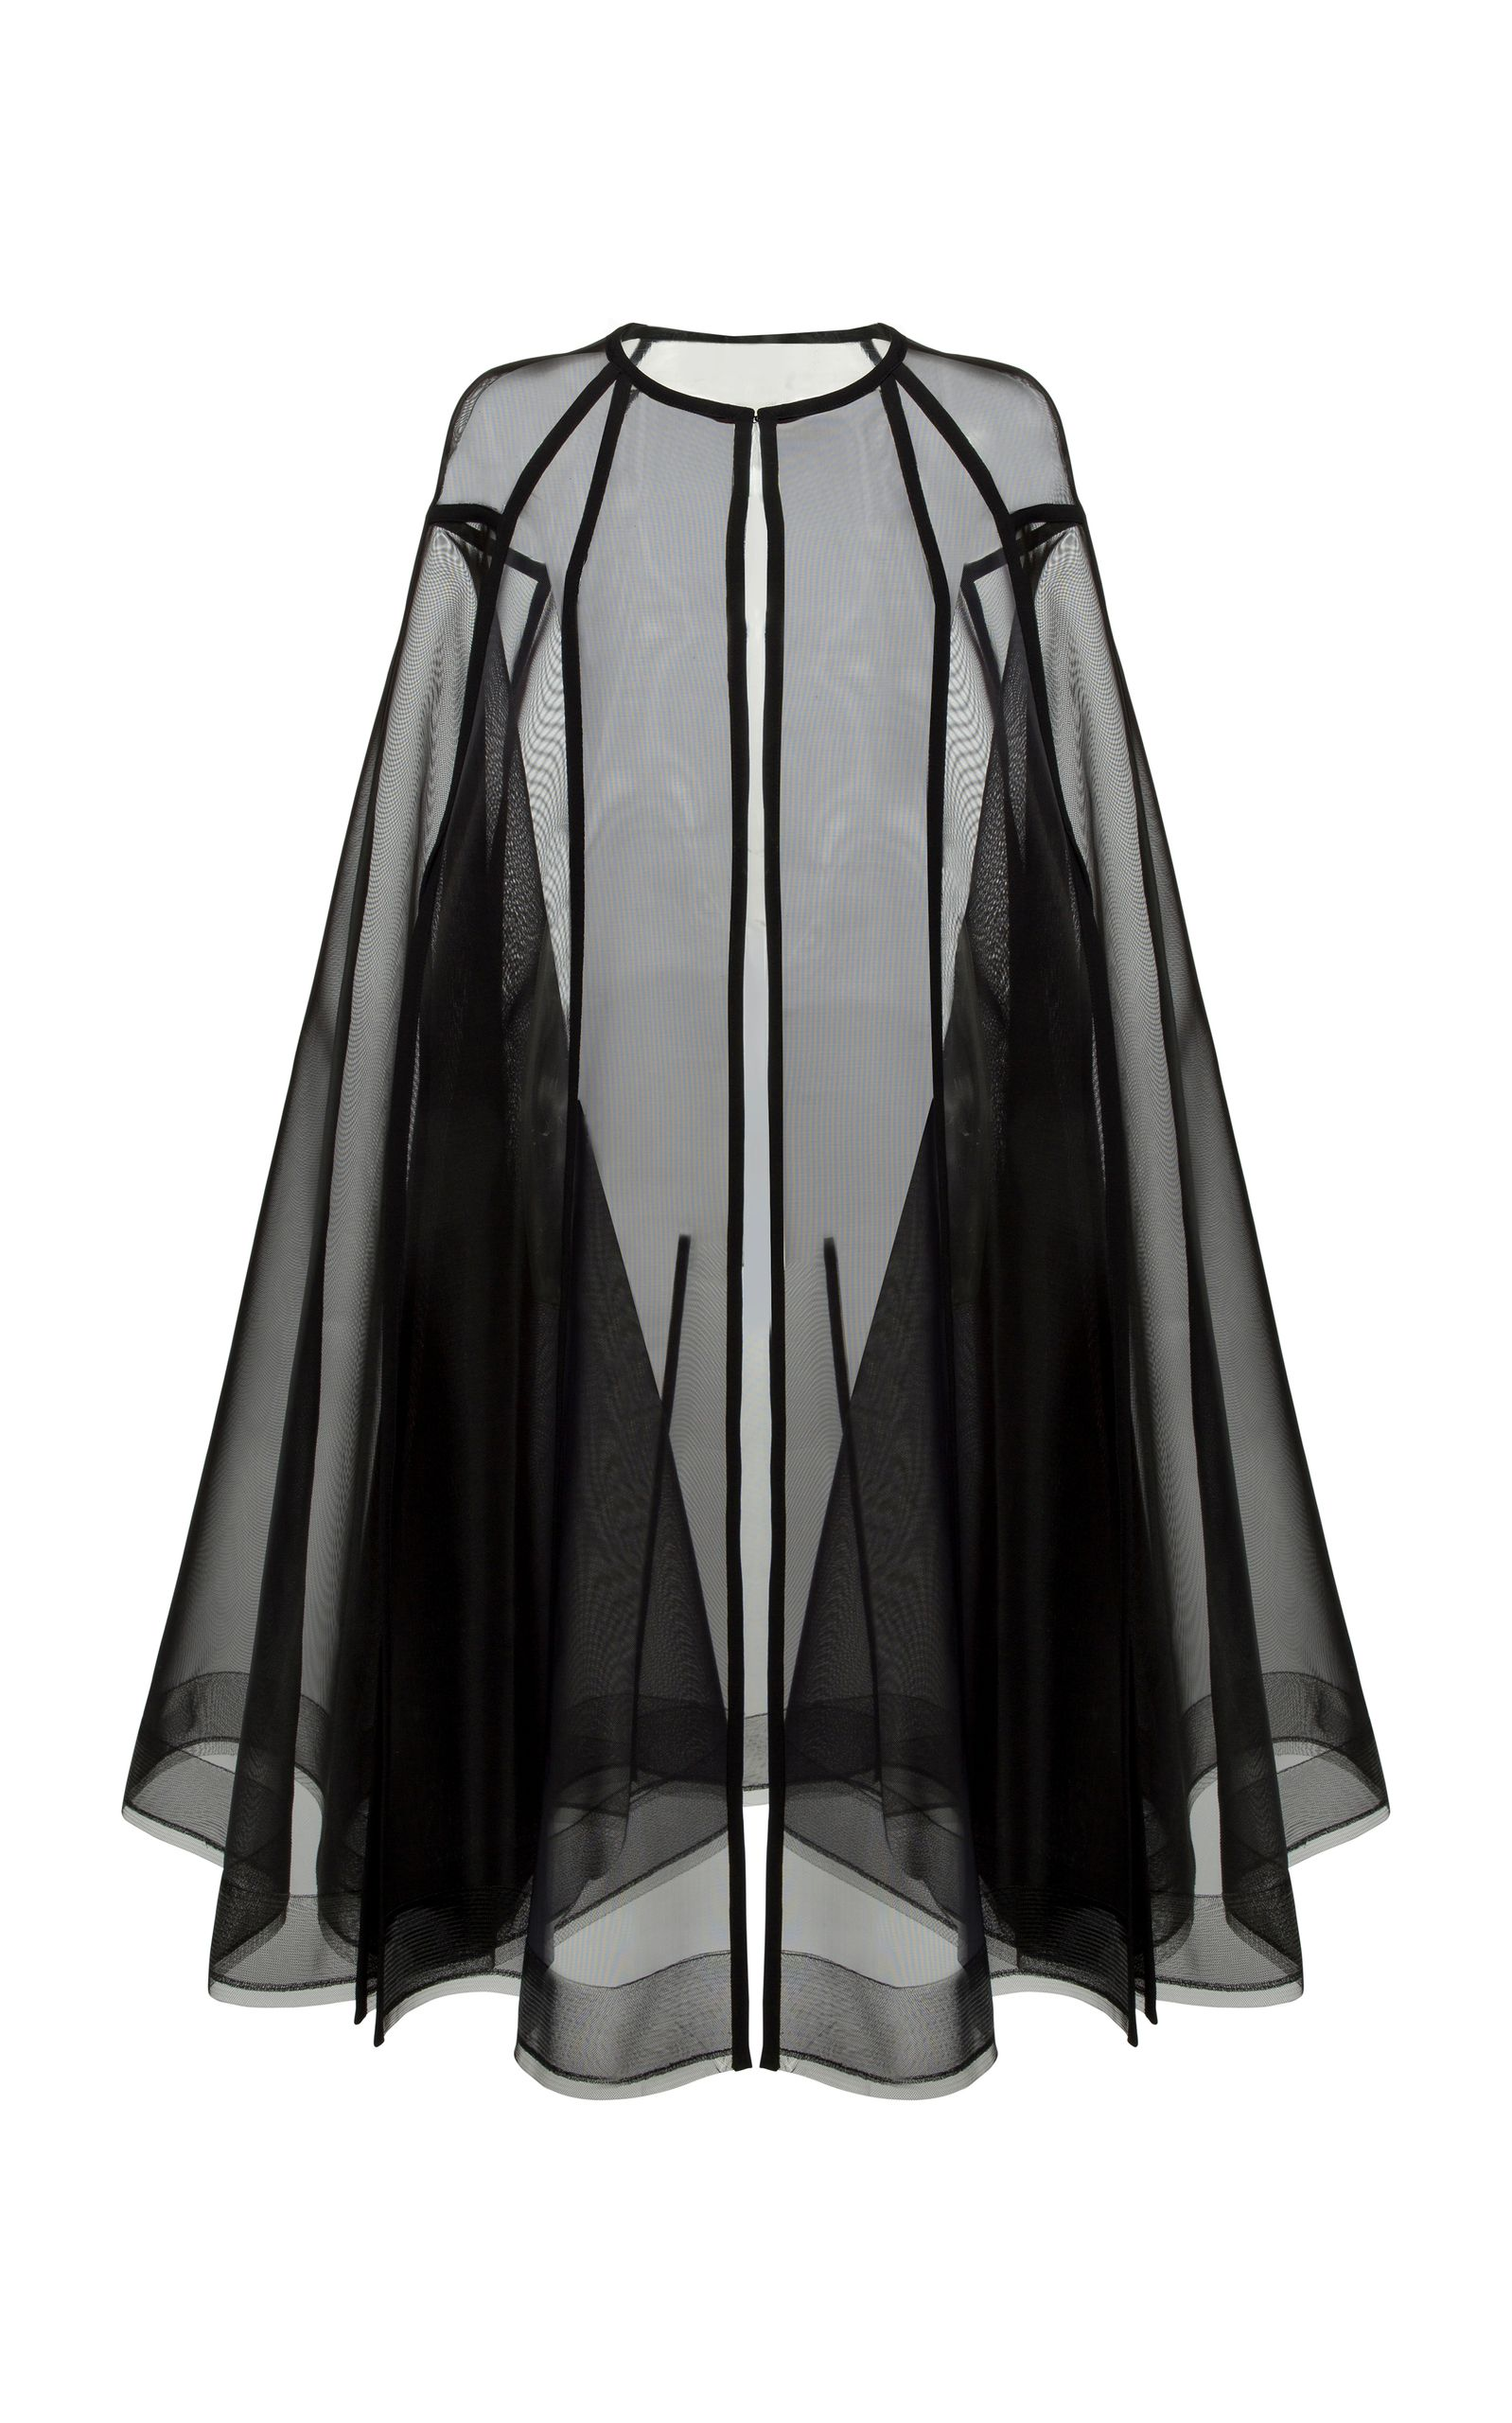 Black Cloak Design Knee Length Dress